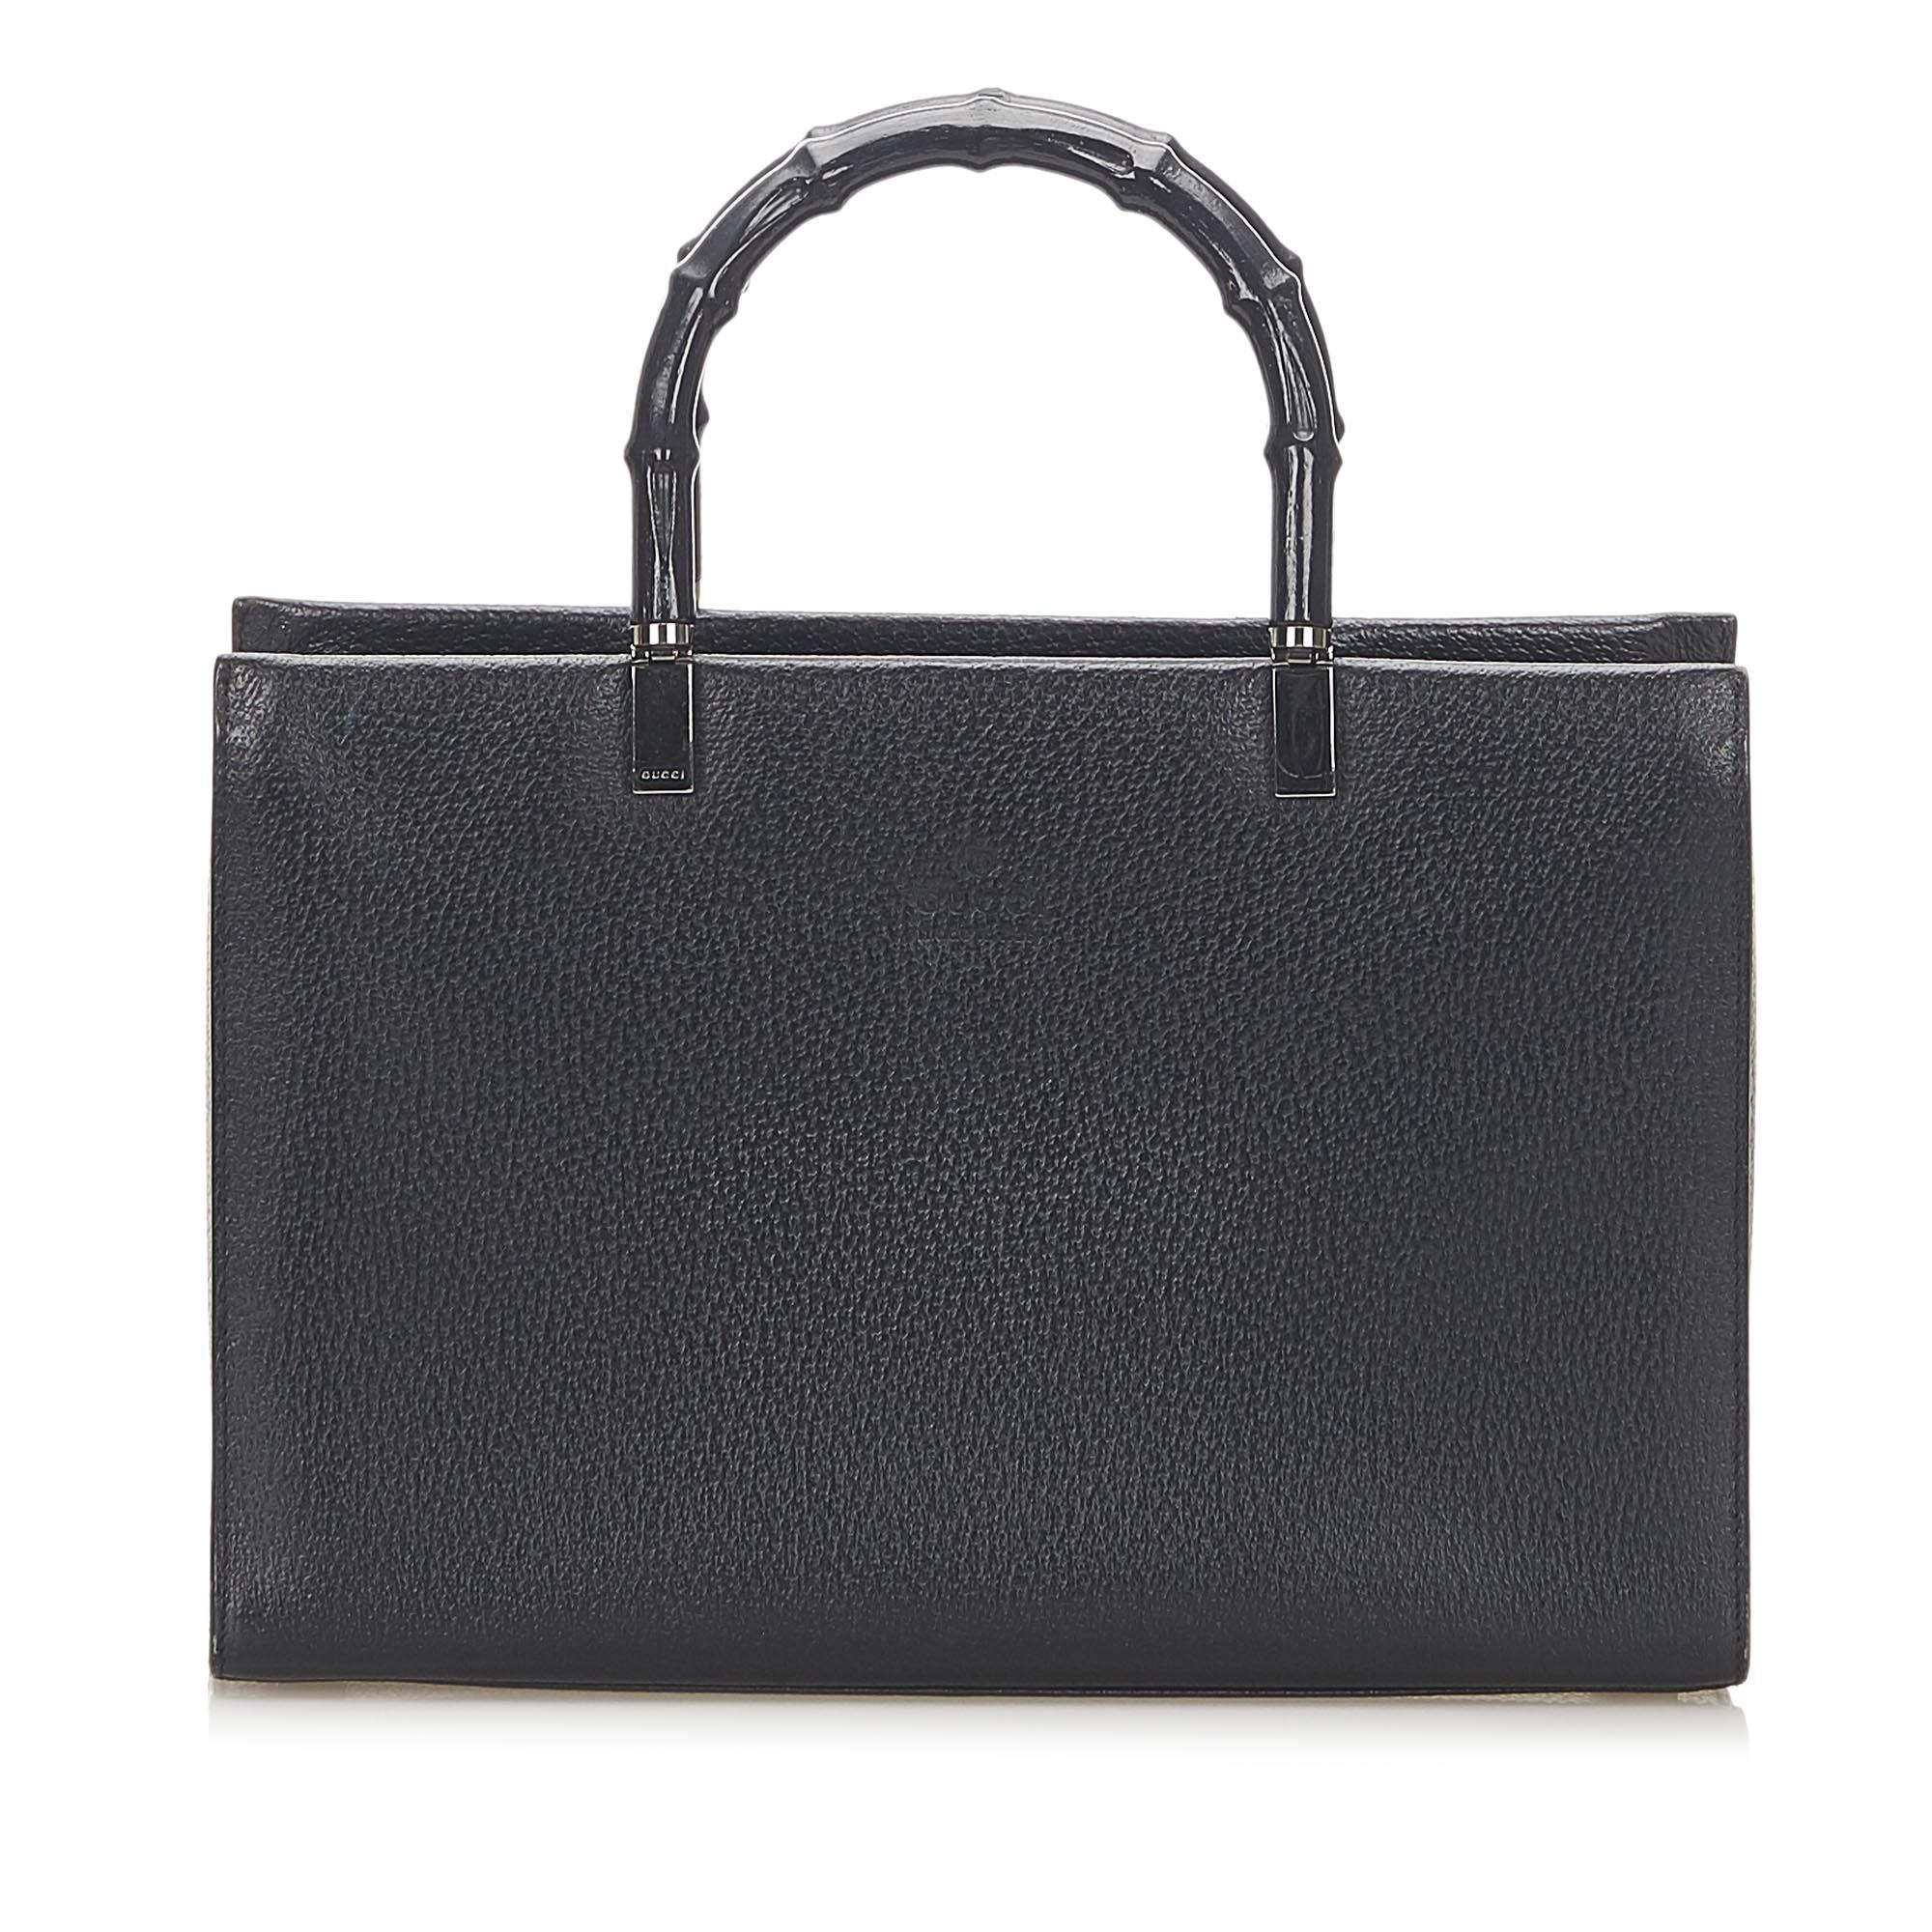 Vintage Gucci Bamboo Leather Satchel Black